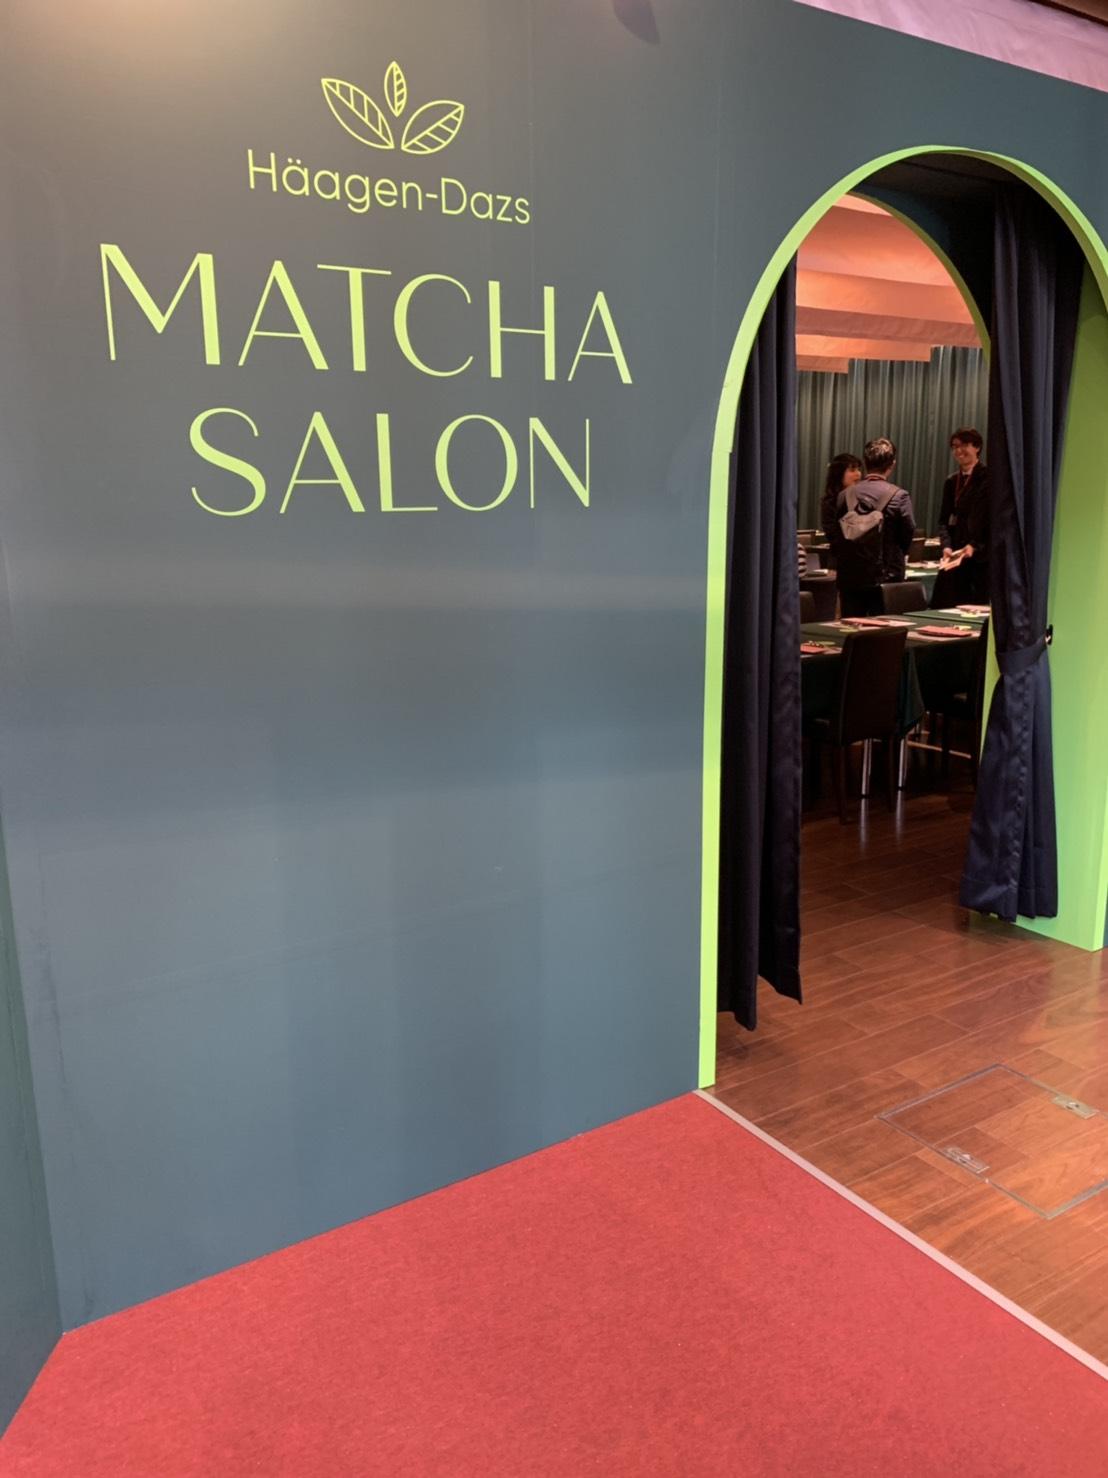 Häagen-Dazs MATCHA SALON(ハーゲンダッツ マッチャサロン)2019年4月23日